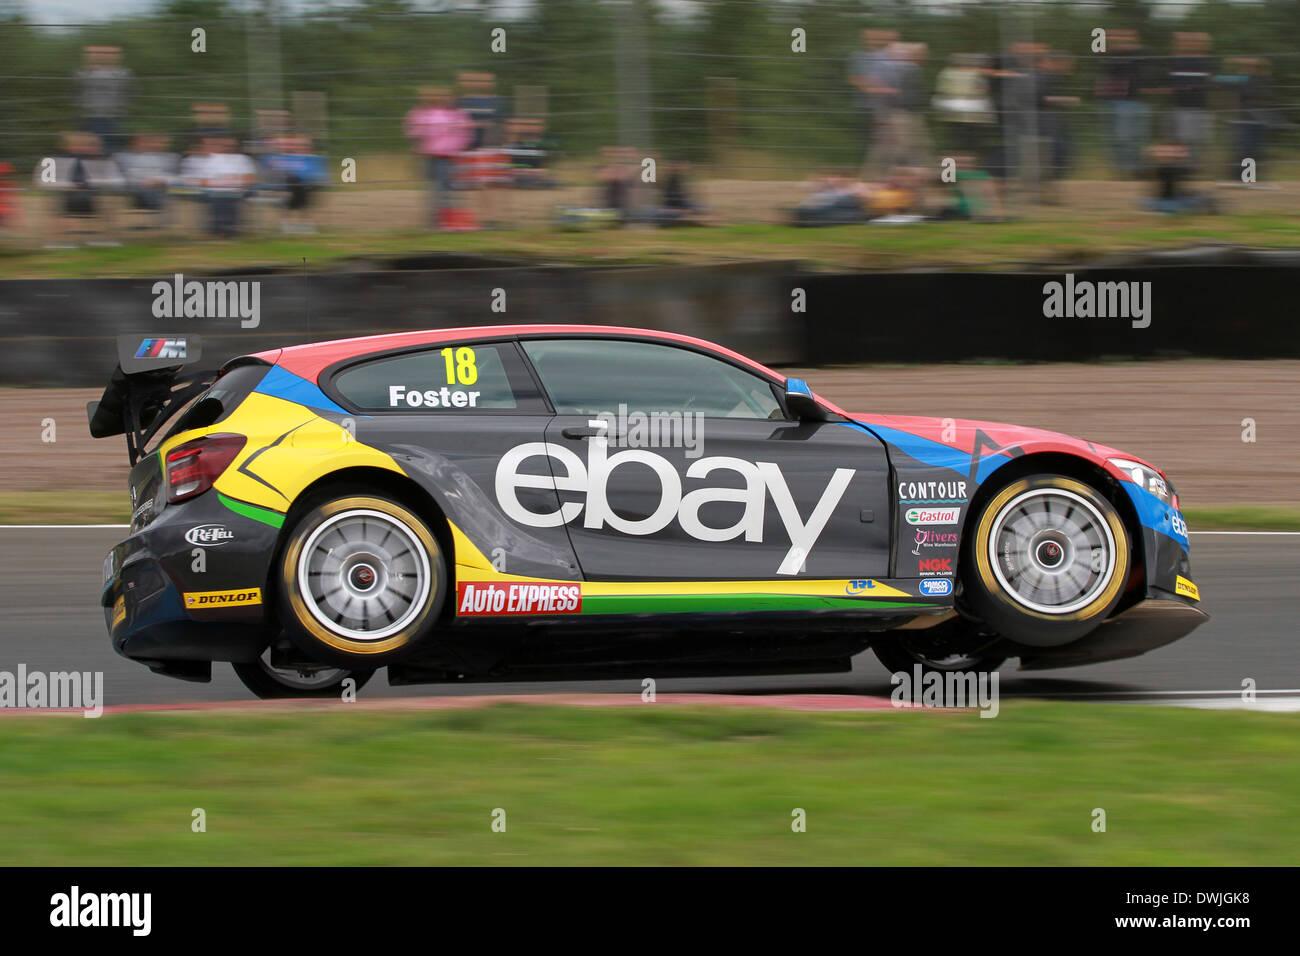 Ebay Motors Stock Photos & Ebay Motors Stock Images - Alamy